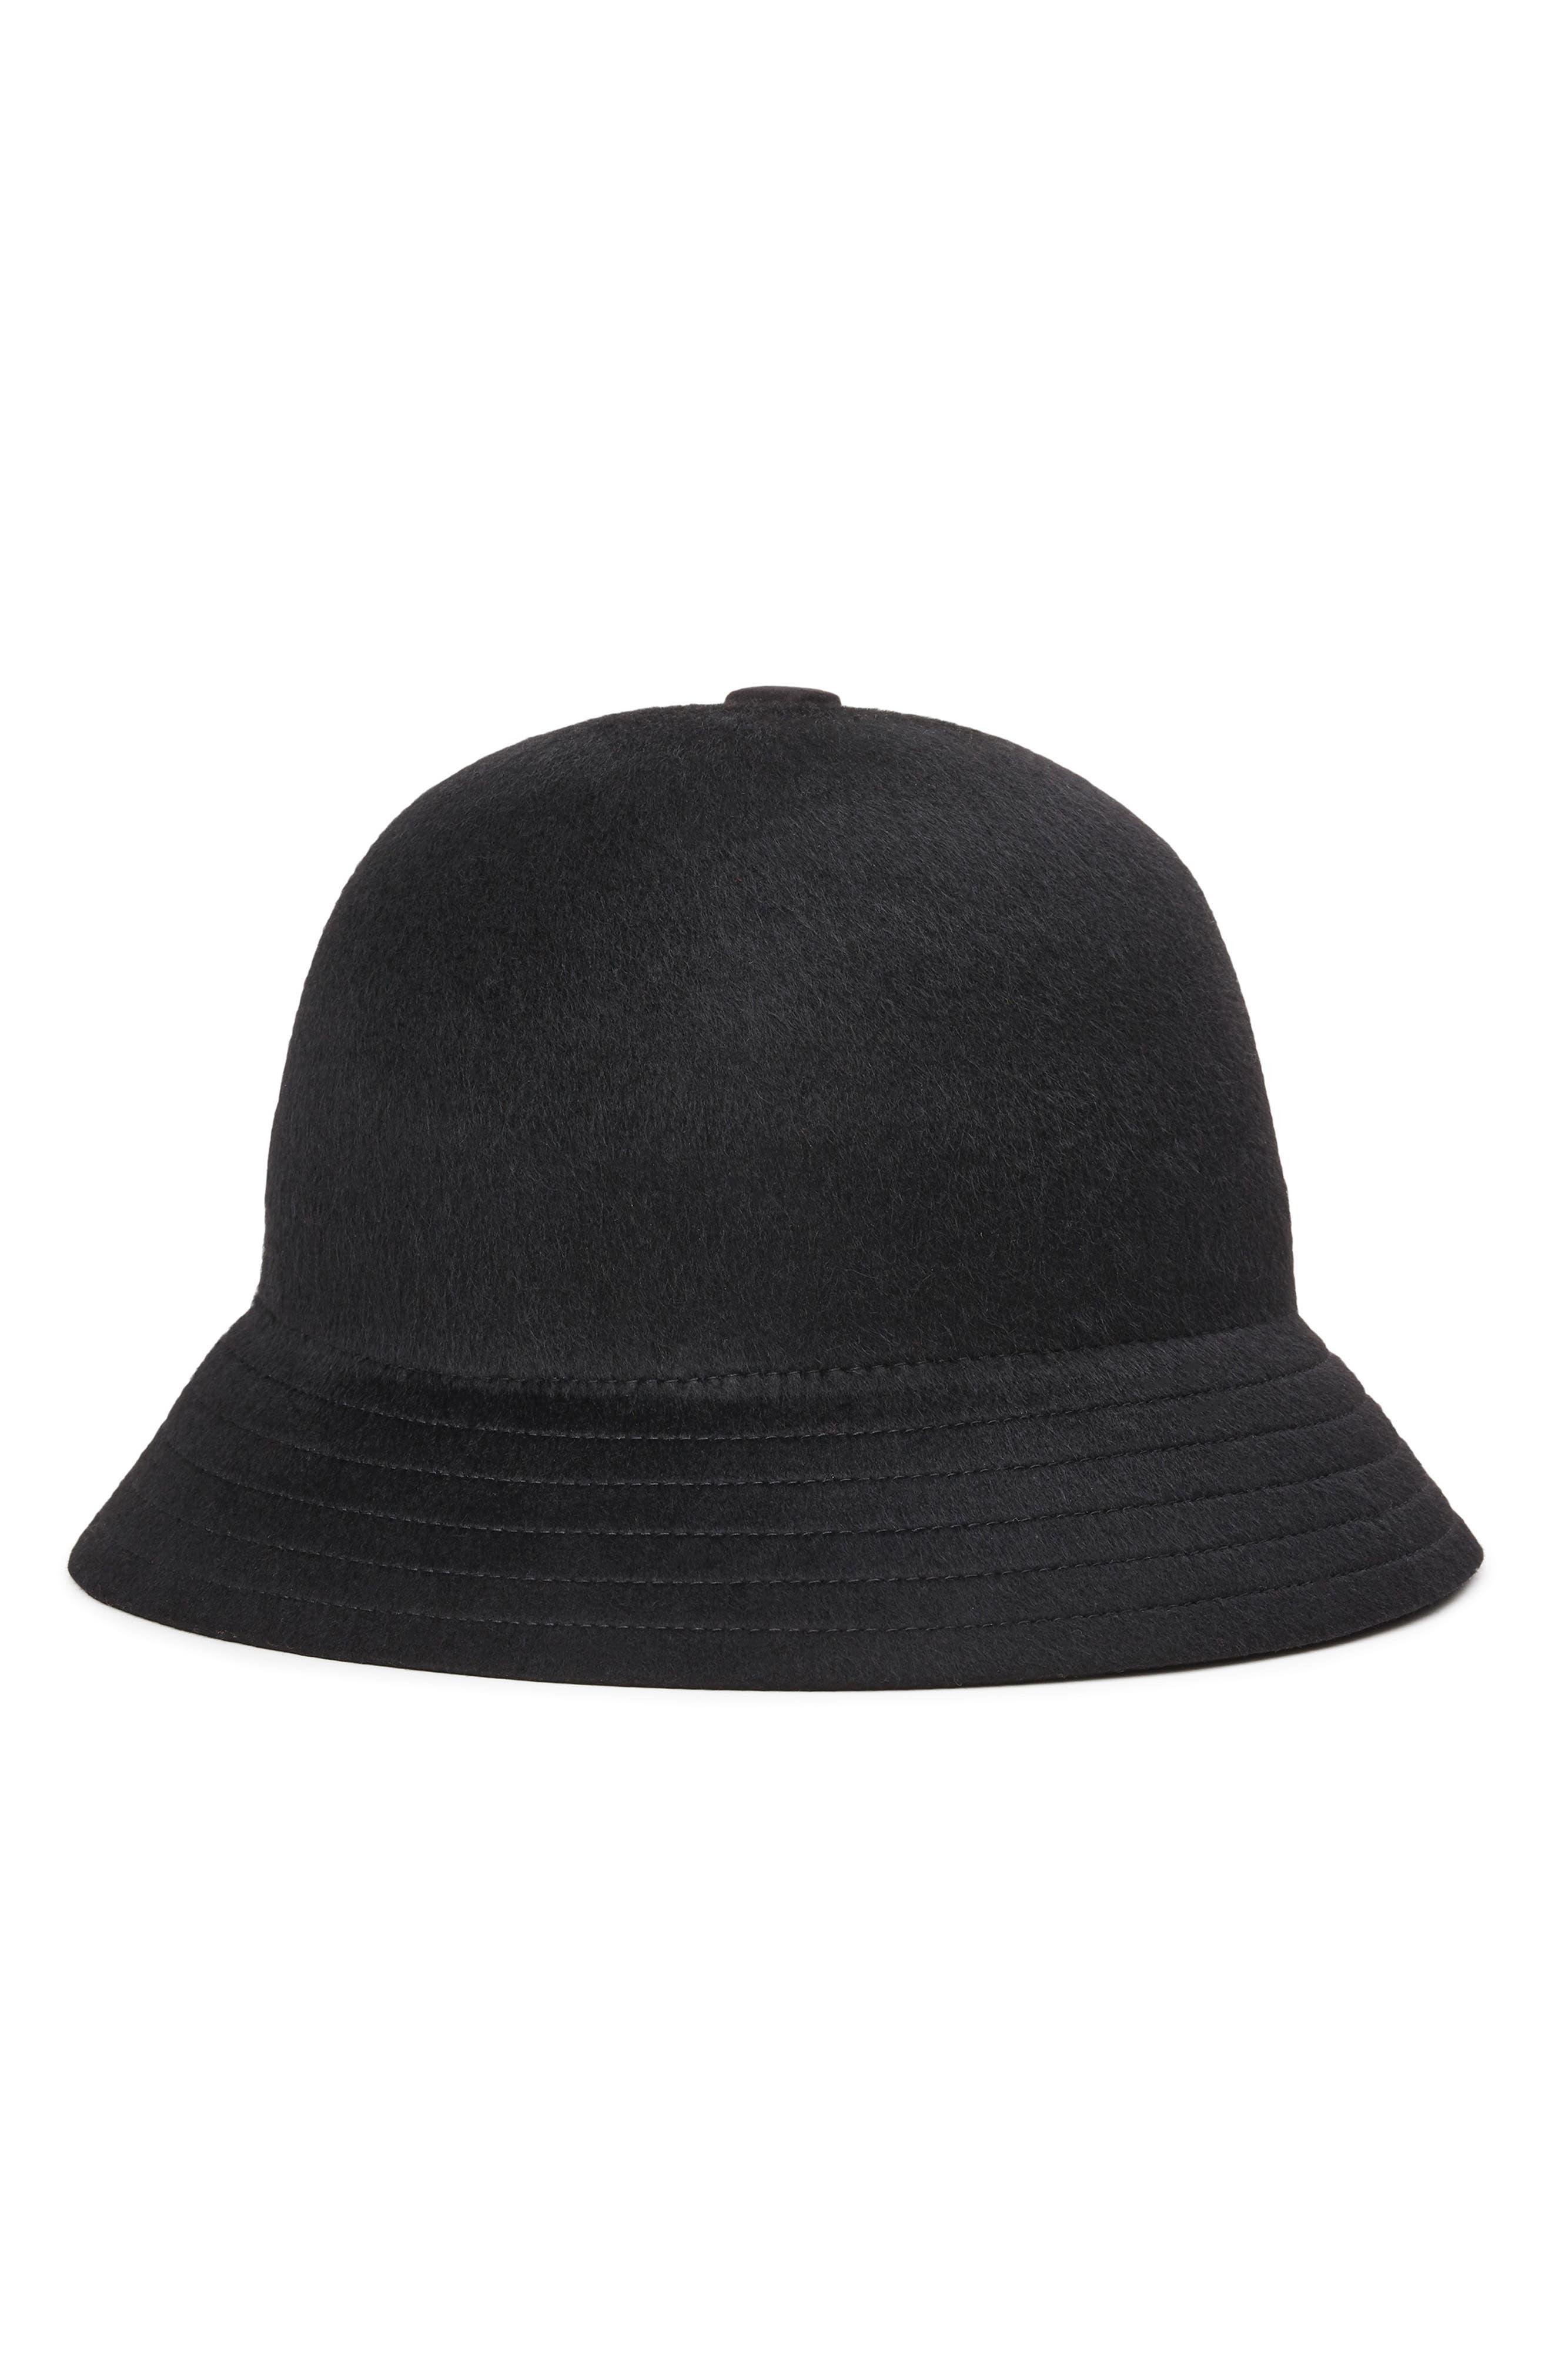 Essex Bucket Hat,                             Main thumbnail 1, color,                             004